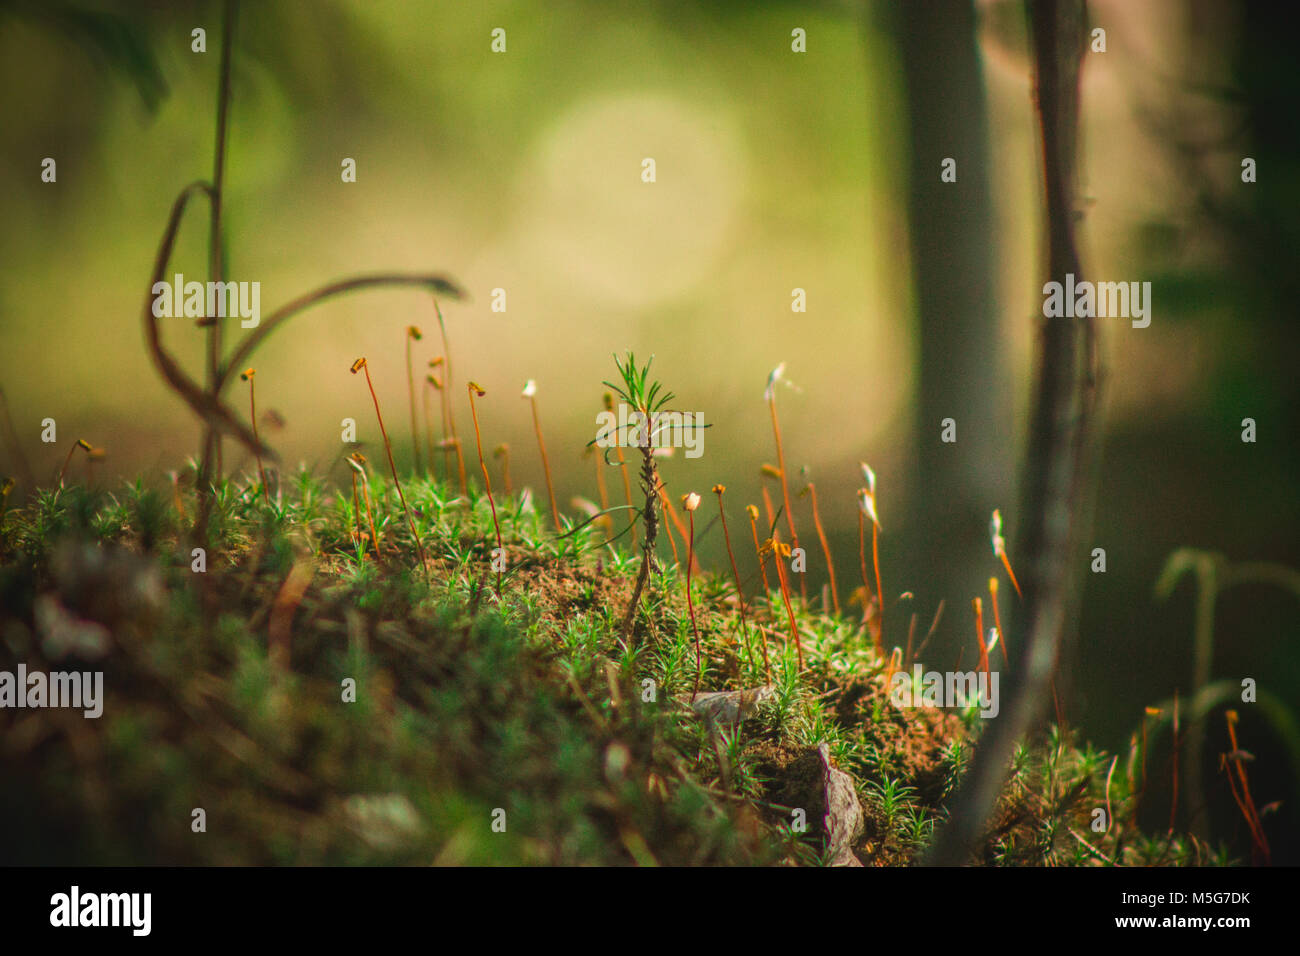 Pine tree closeup - the moss on the stump, macro plants - Stock Image